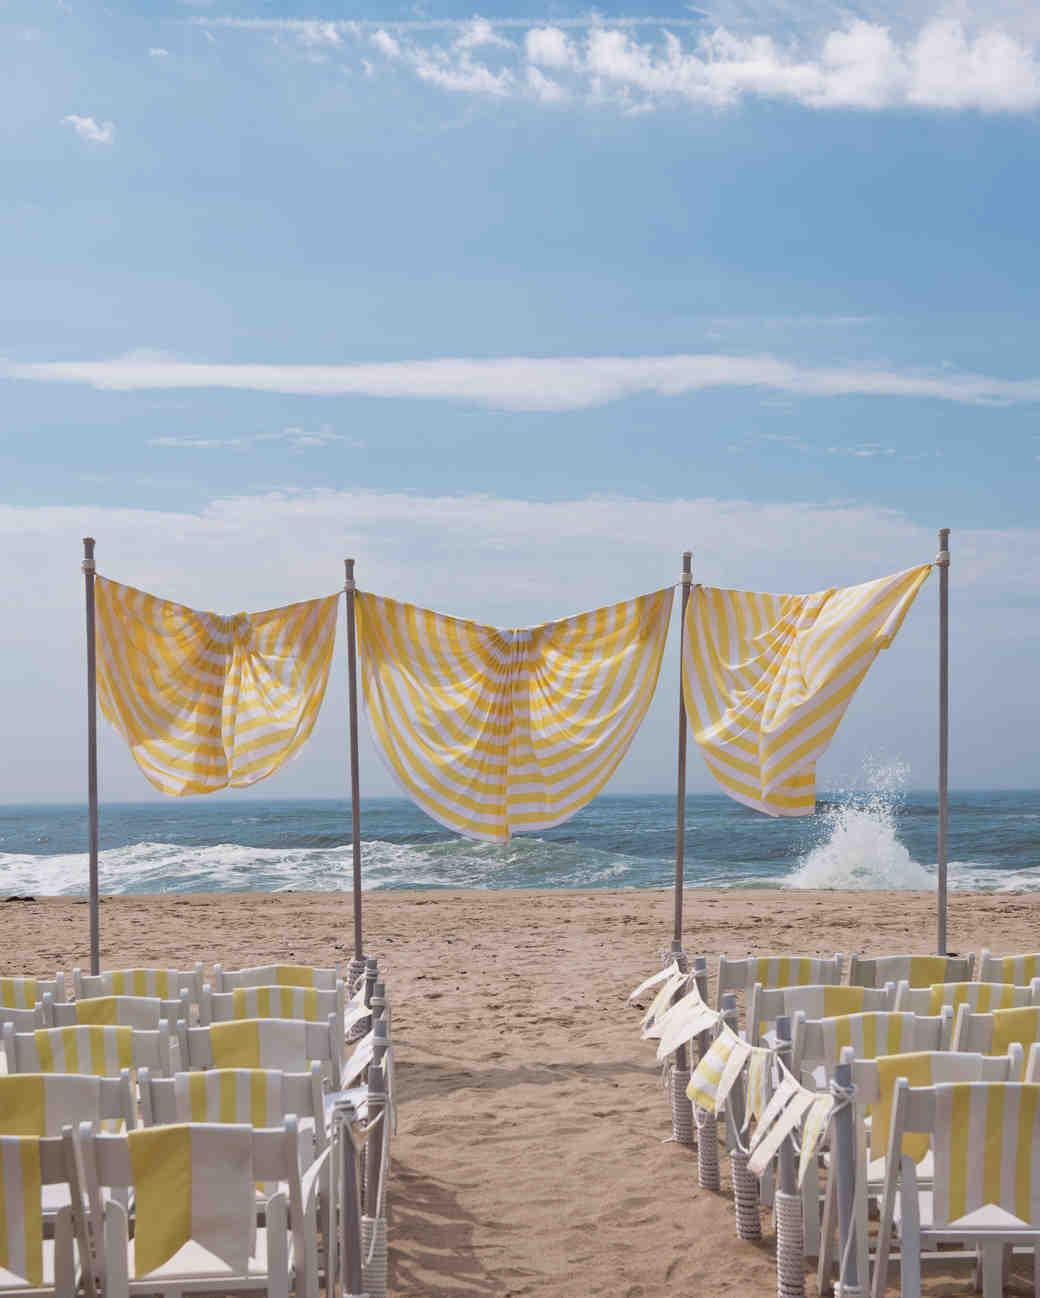 Noble Diy Wedding Backdrop Ceremony Marker Beach Vert Diy Beach Wedding Ideas A Destination Celebration Beach Wedding Decorations Diy Beach Party Decorations Diy home decor Beach Decorations Diy